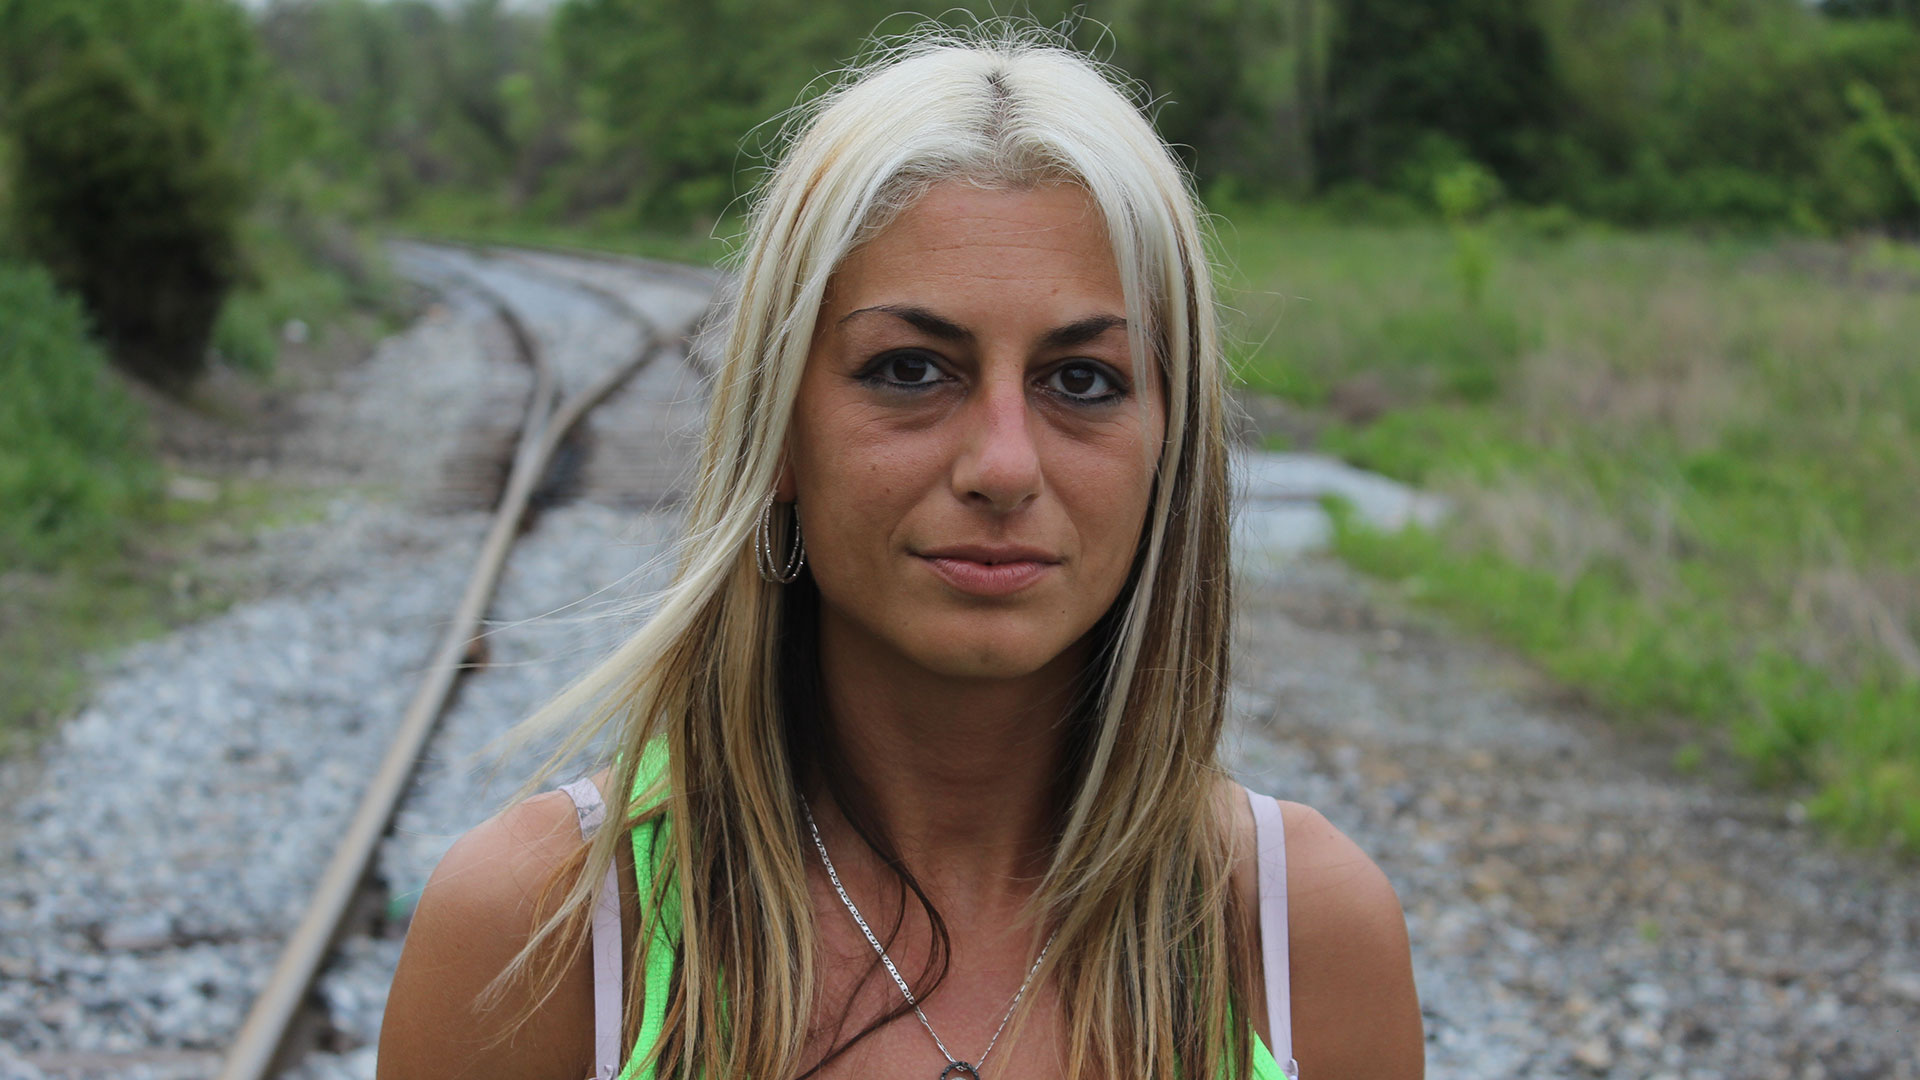 Jessica Samko Bio, Wiki, Age, Vocation, Net Worth, and Social Life